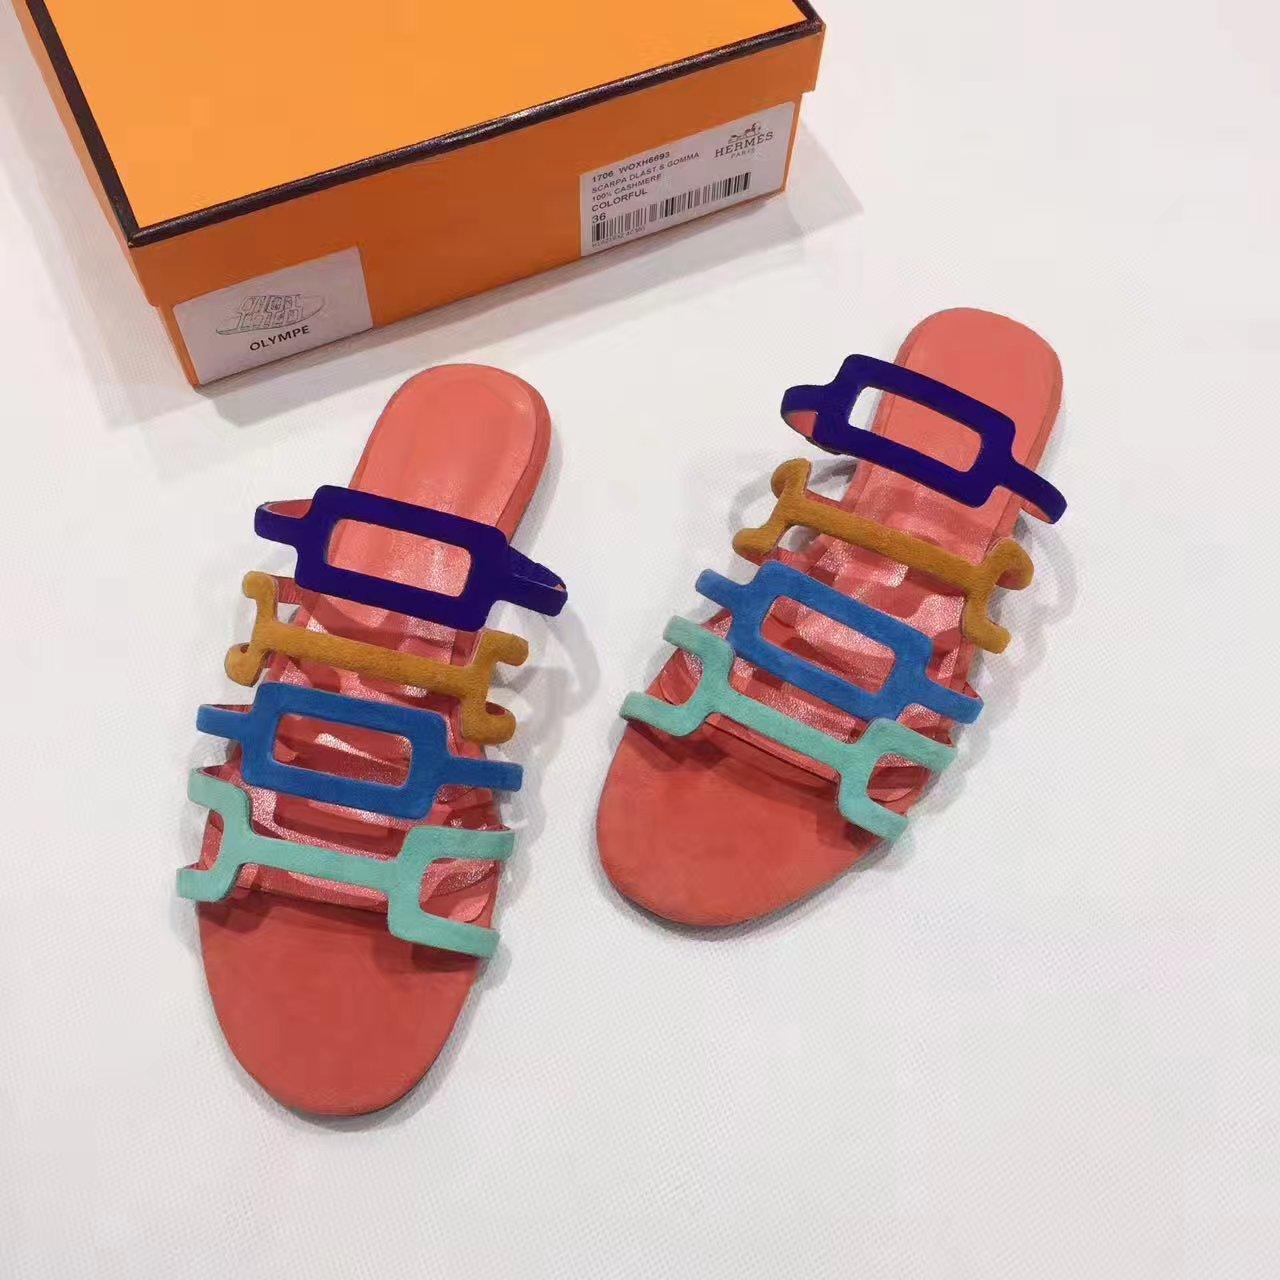 Hermes凉鞋17ss专柜最新款彩虹拖鞋